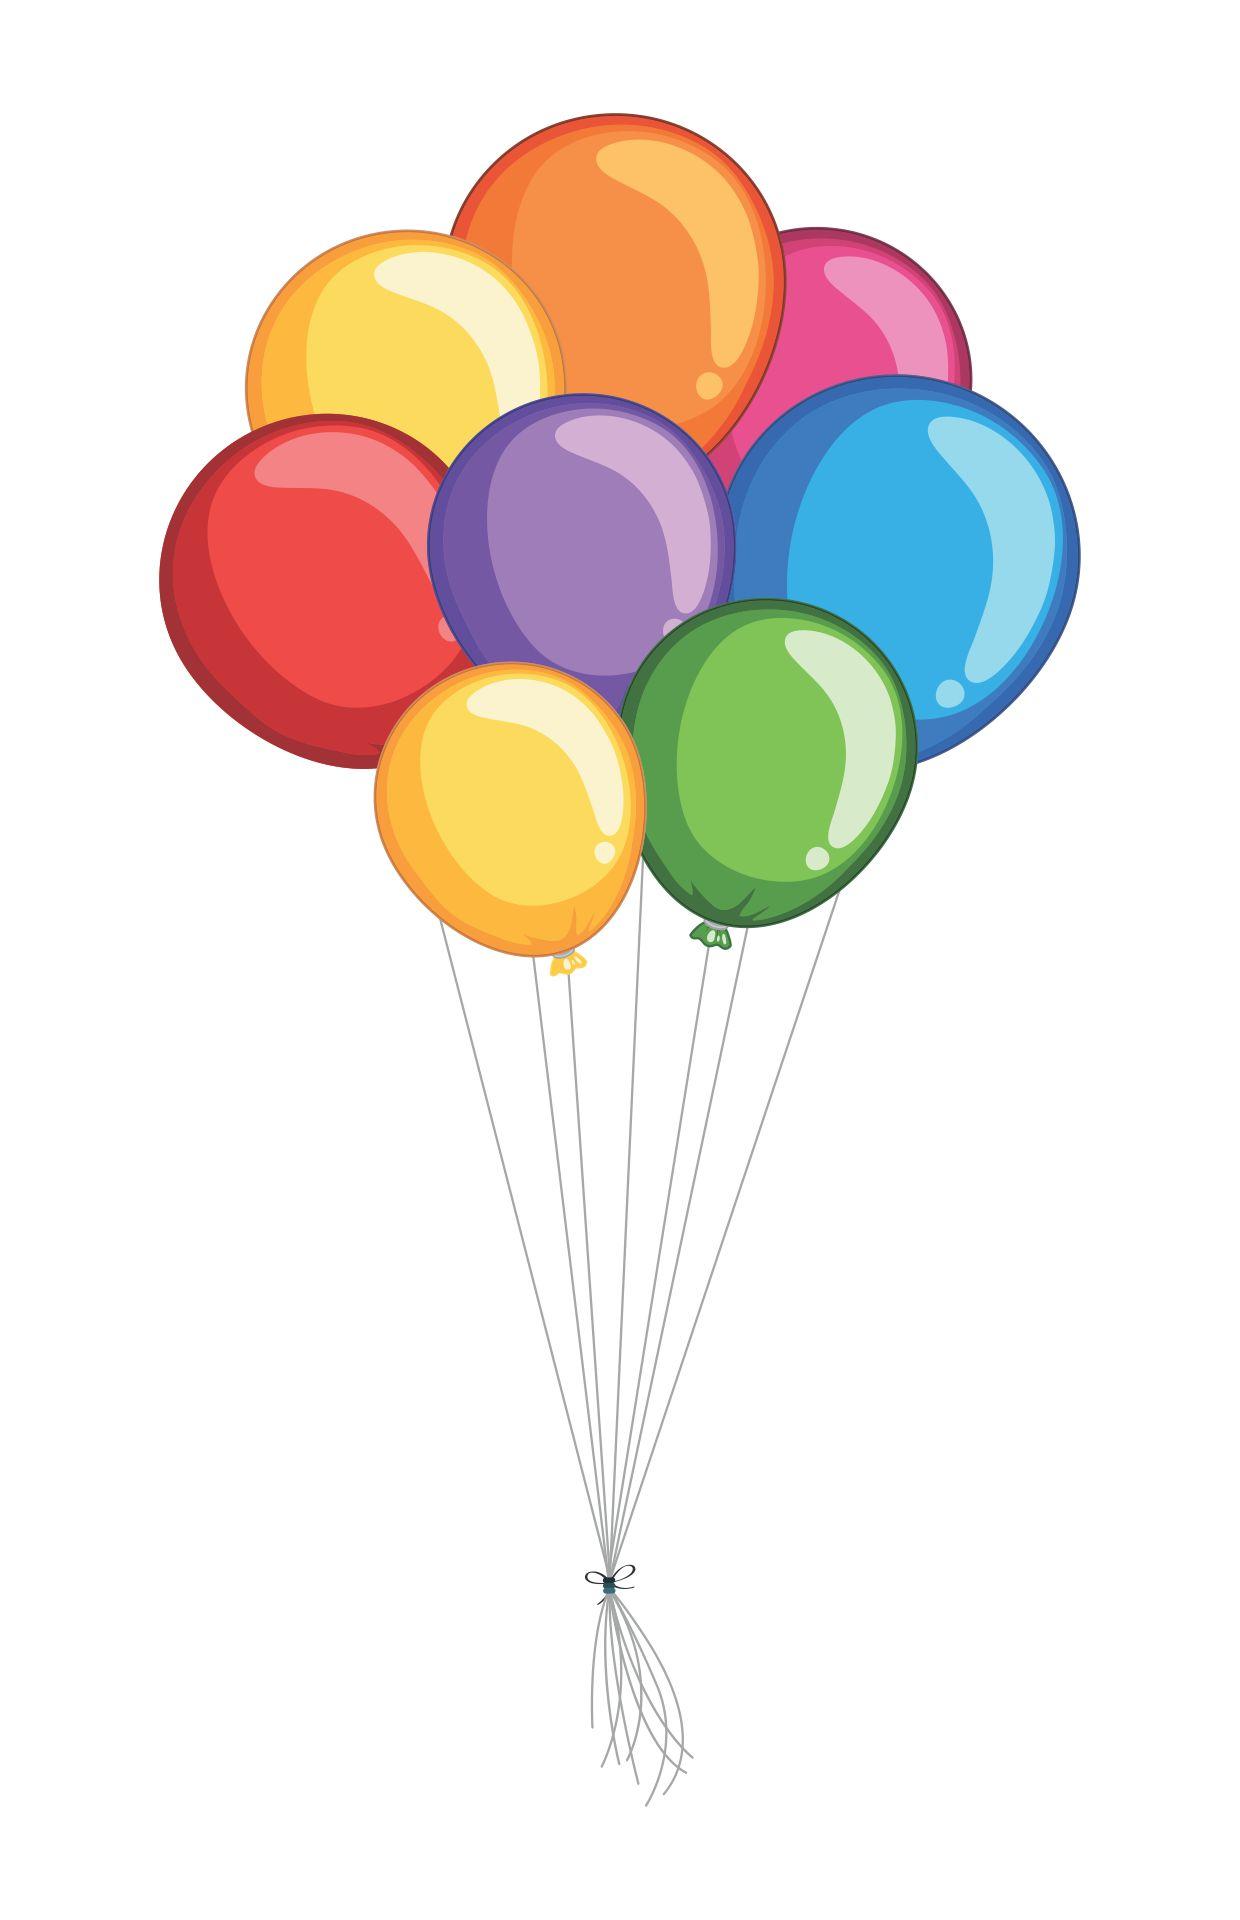 Free Printable Balloon Images